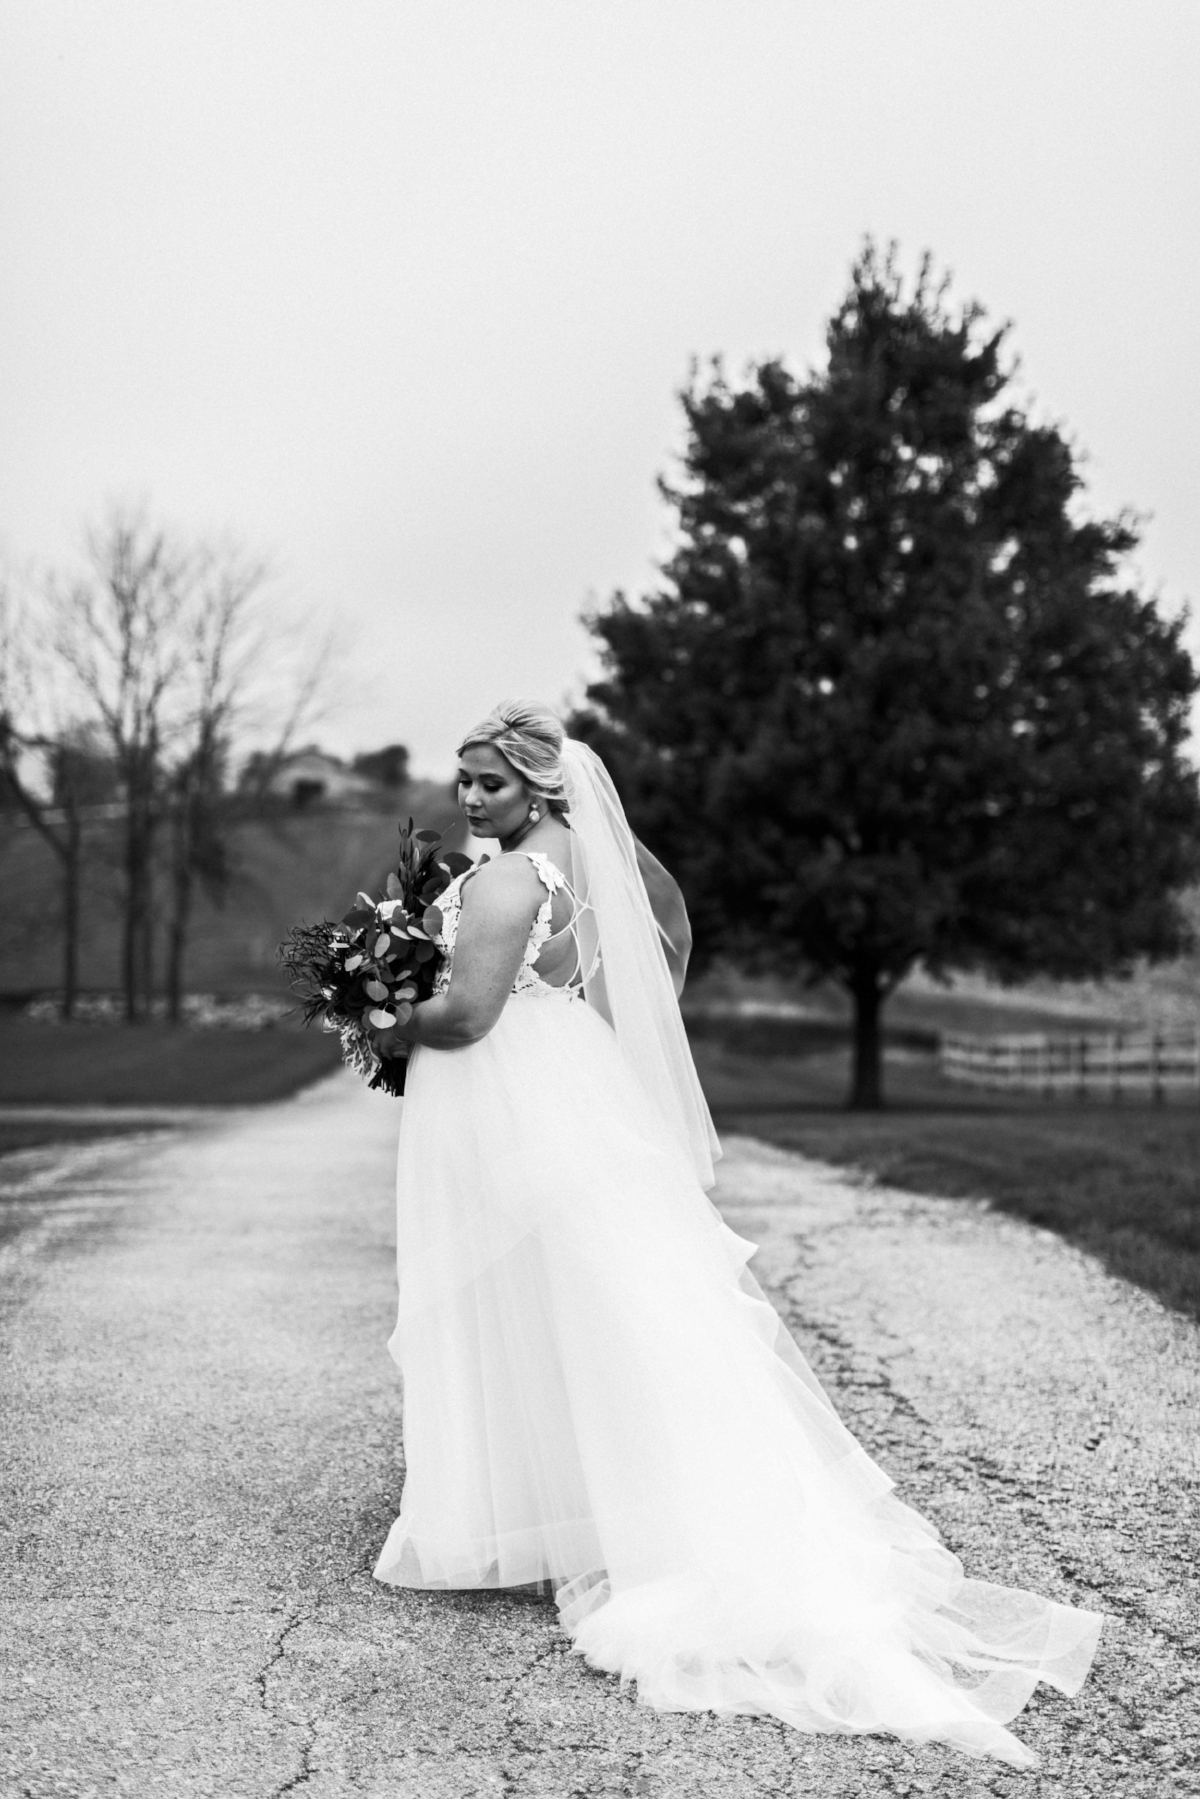 BridesbyYoung-Curvy-BlushHayleyPaige-Madi-Wedding-Inspiration-17.jpg